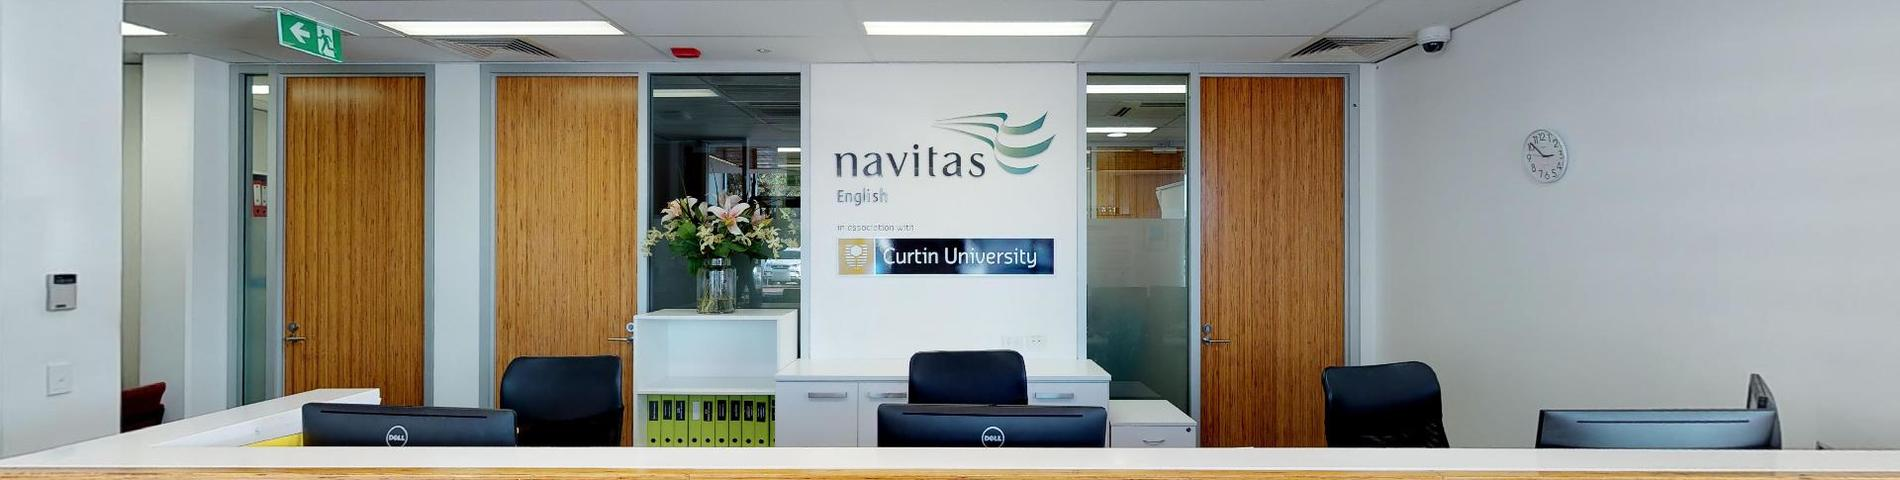 Navitas English resim 1